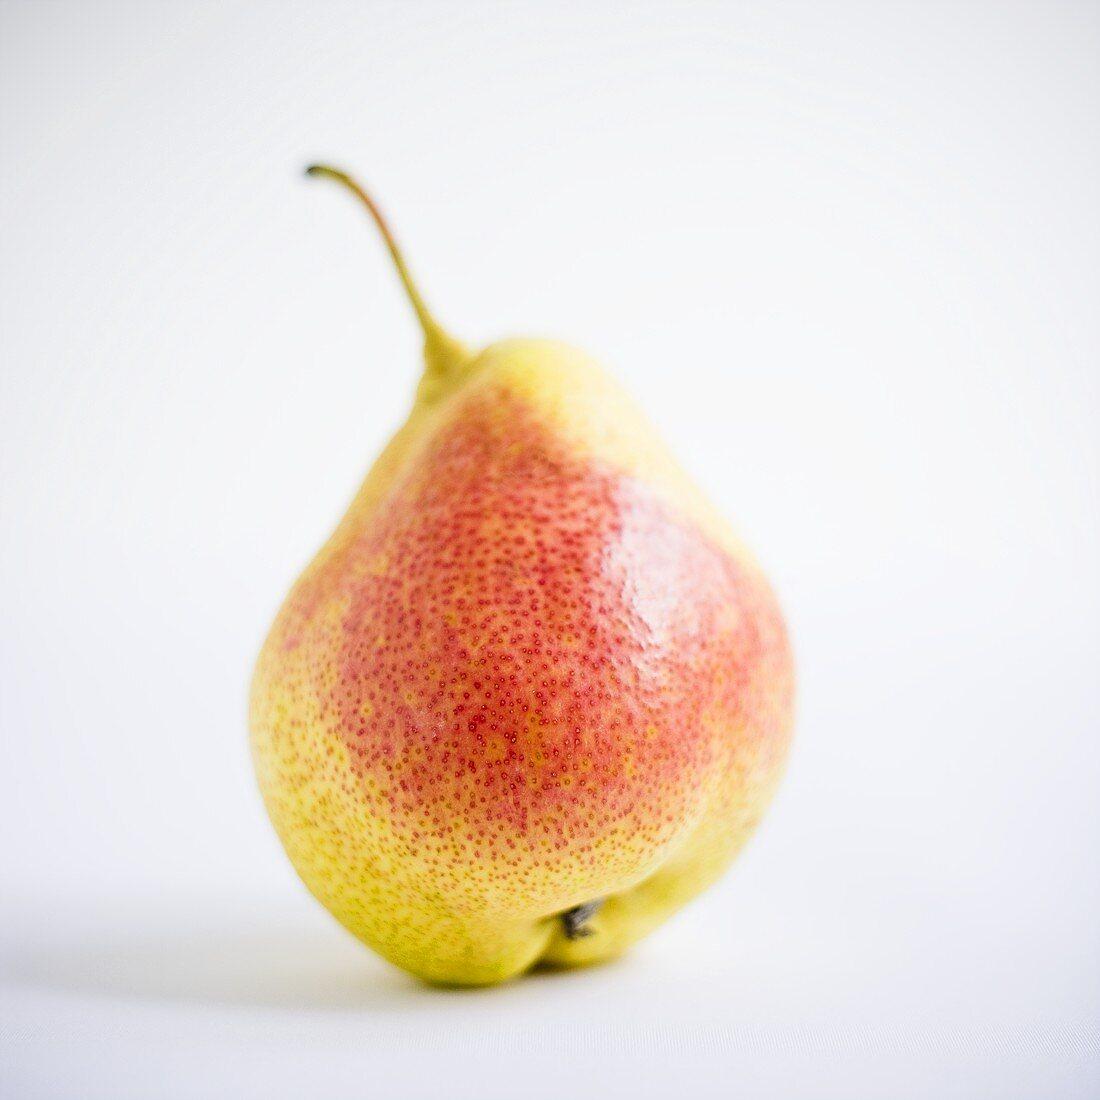 A Forelle pear